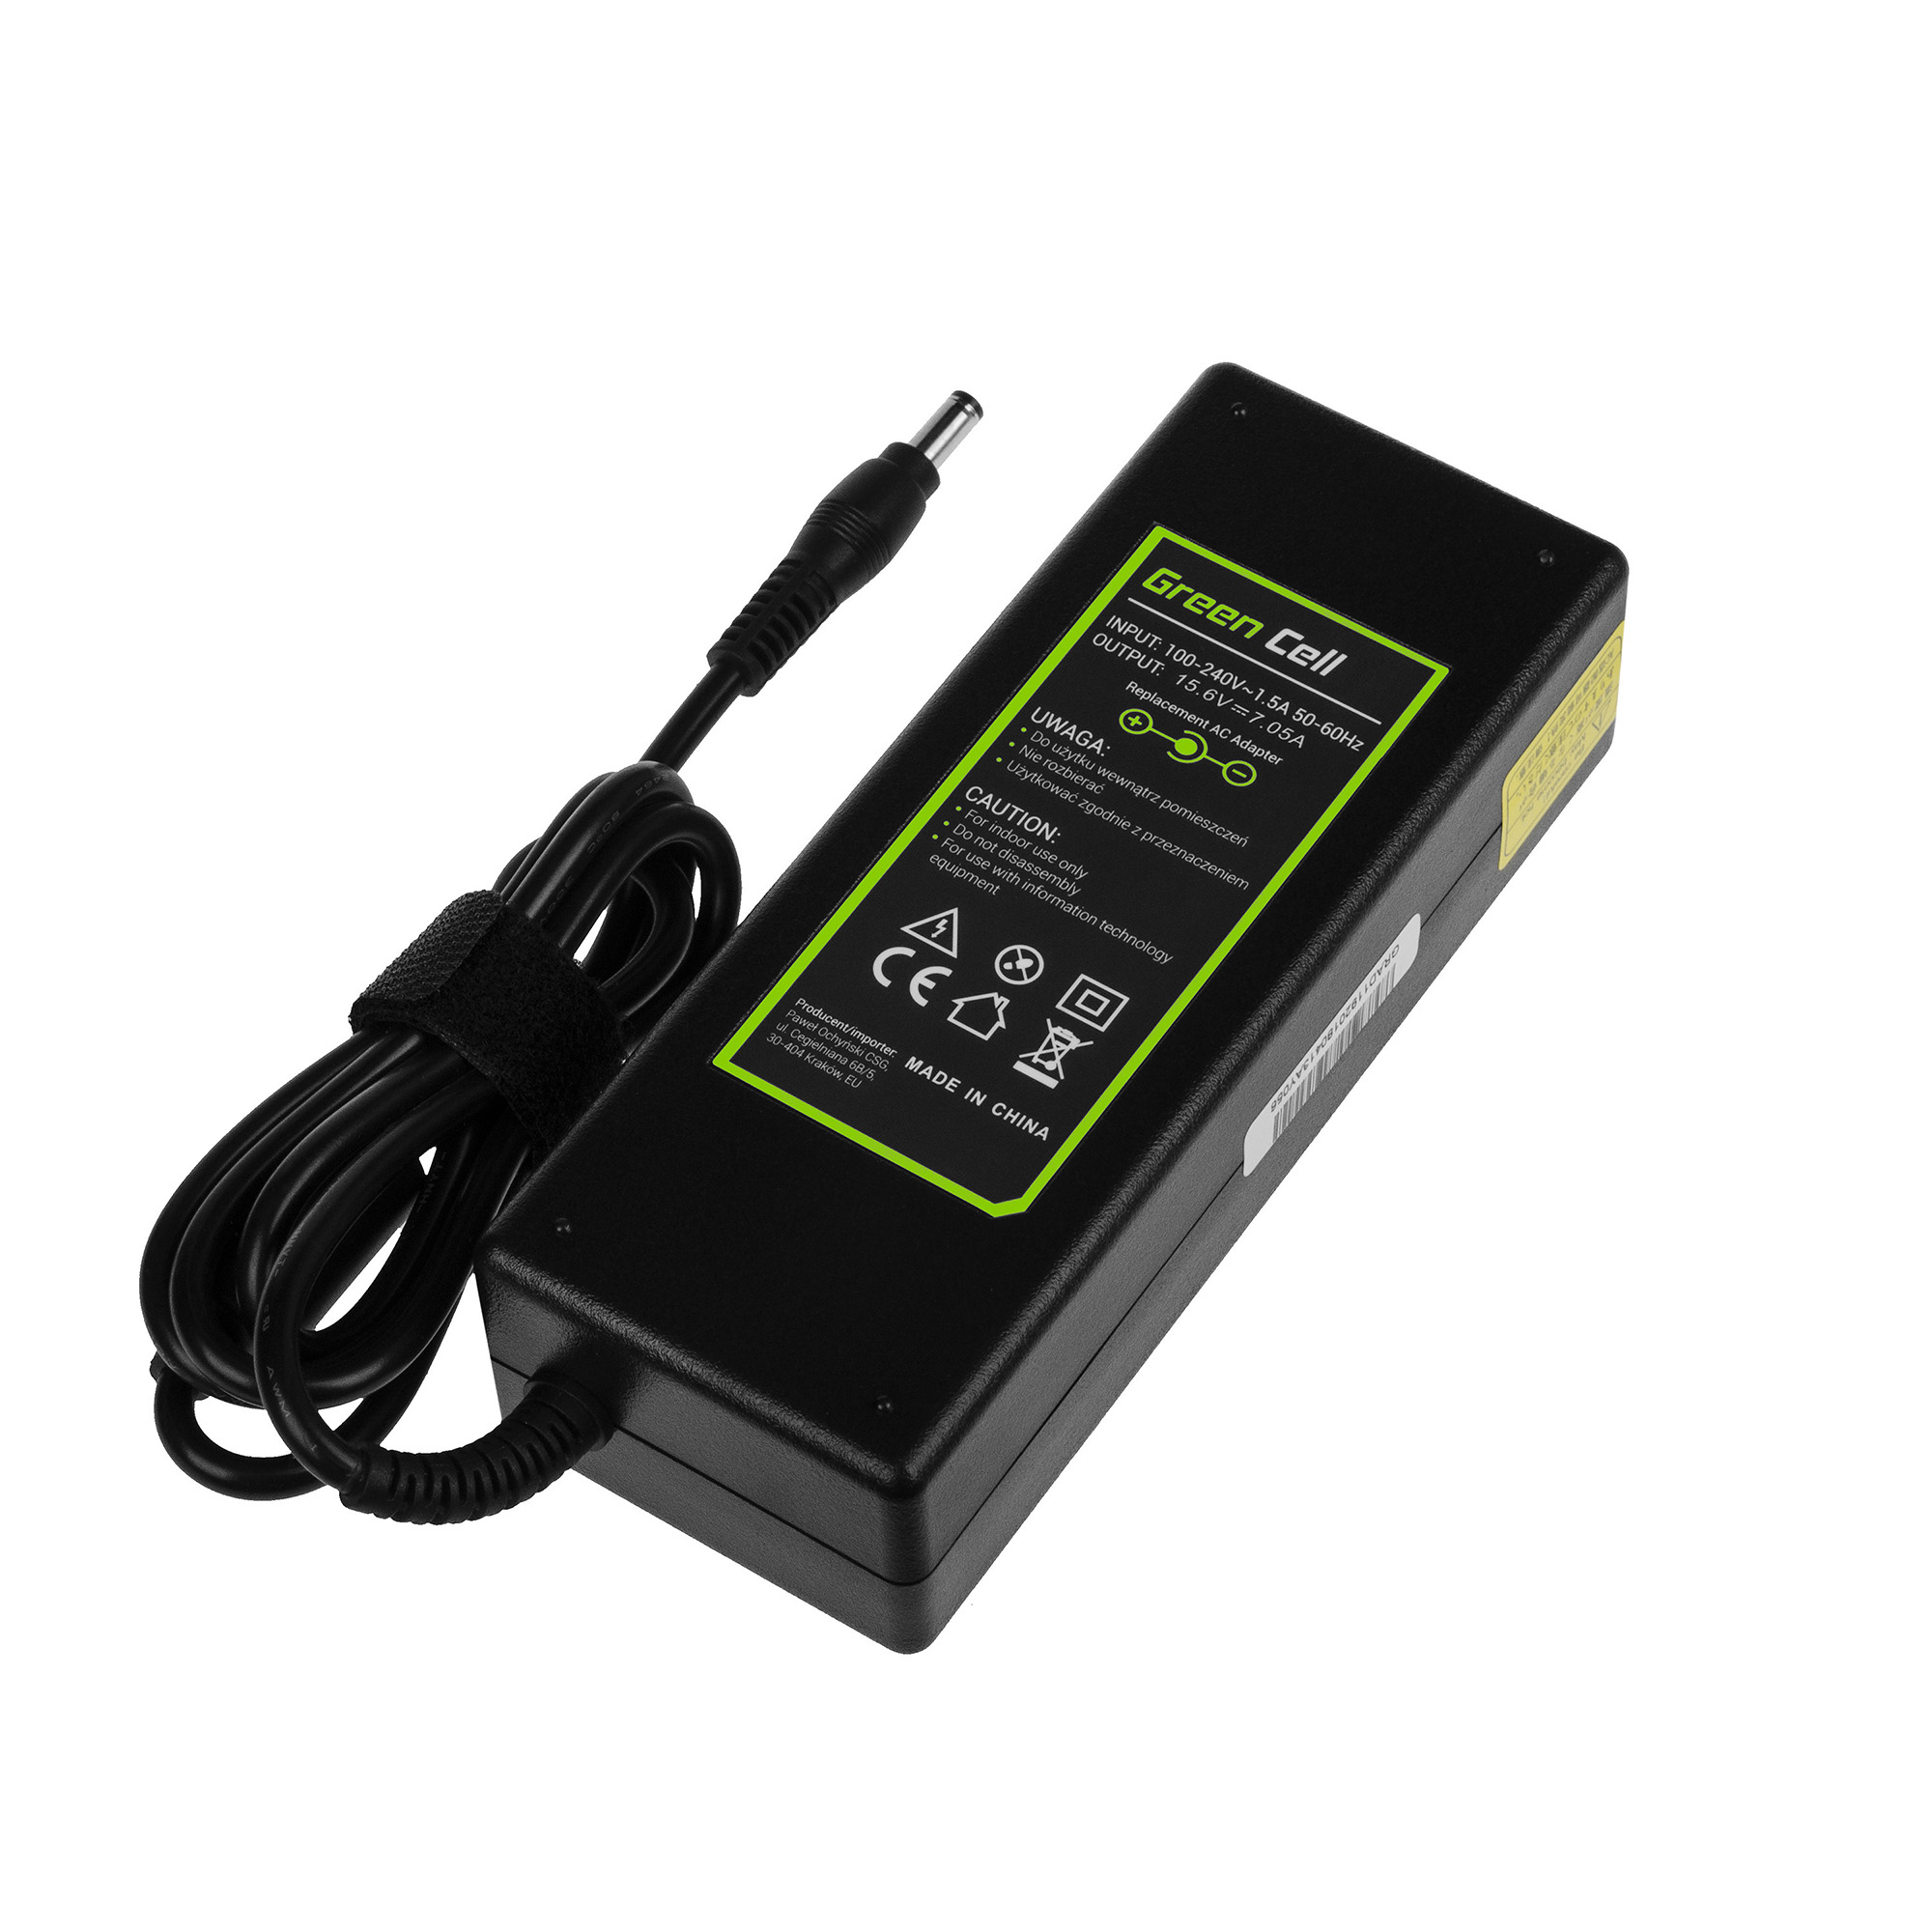 Cargador-Adaptador-Para-Panasonic-CF-AA5713A-M1-portatil